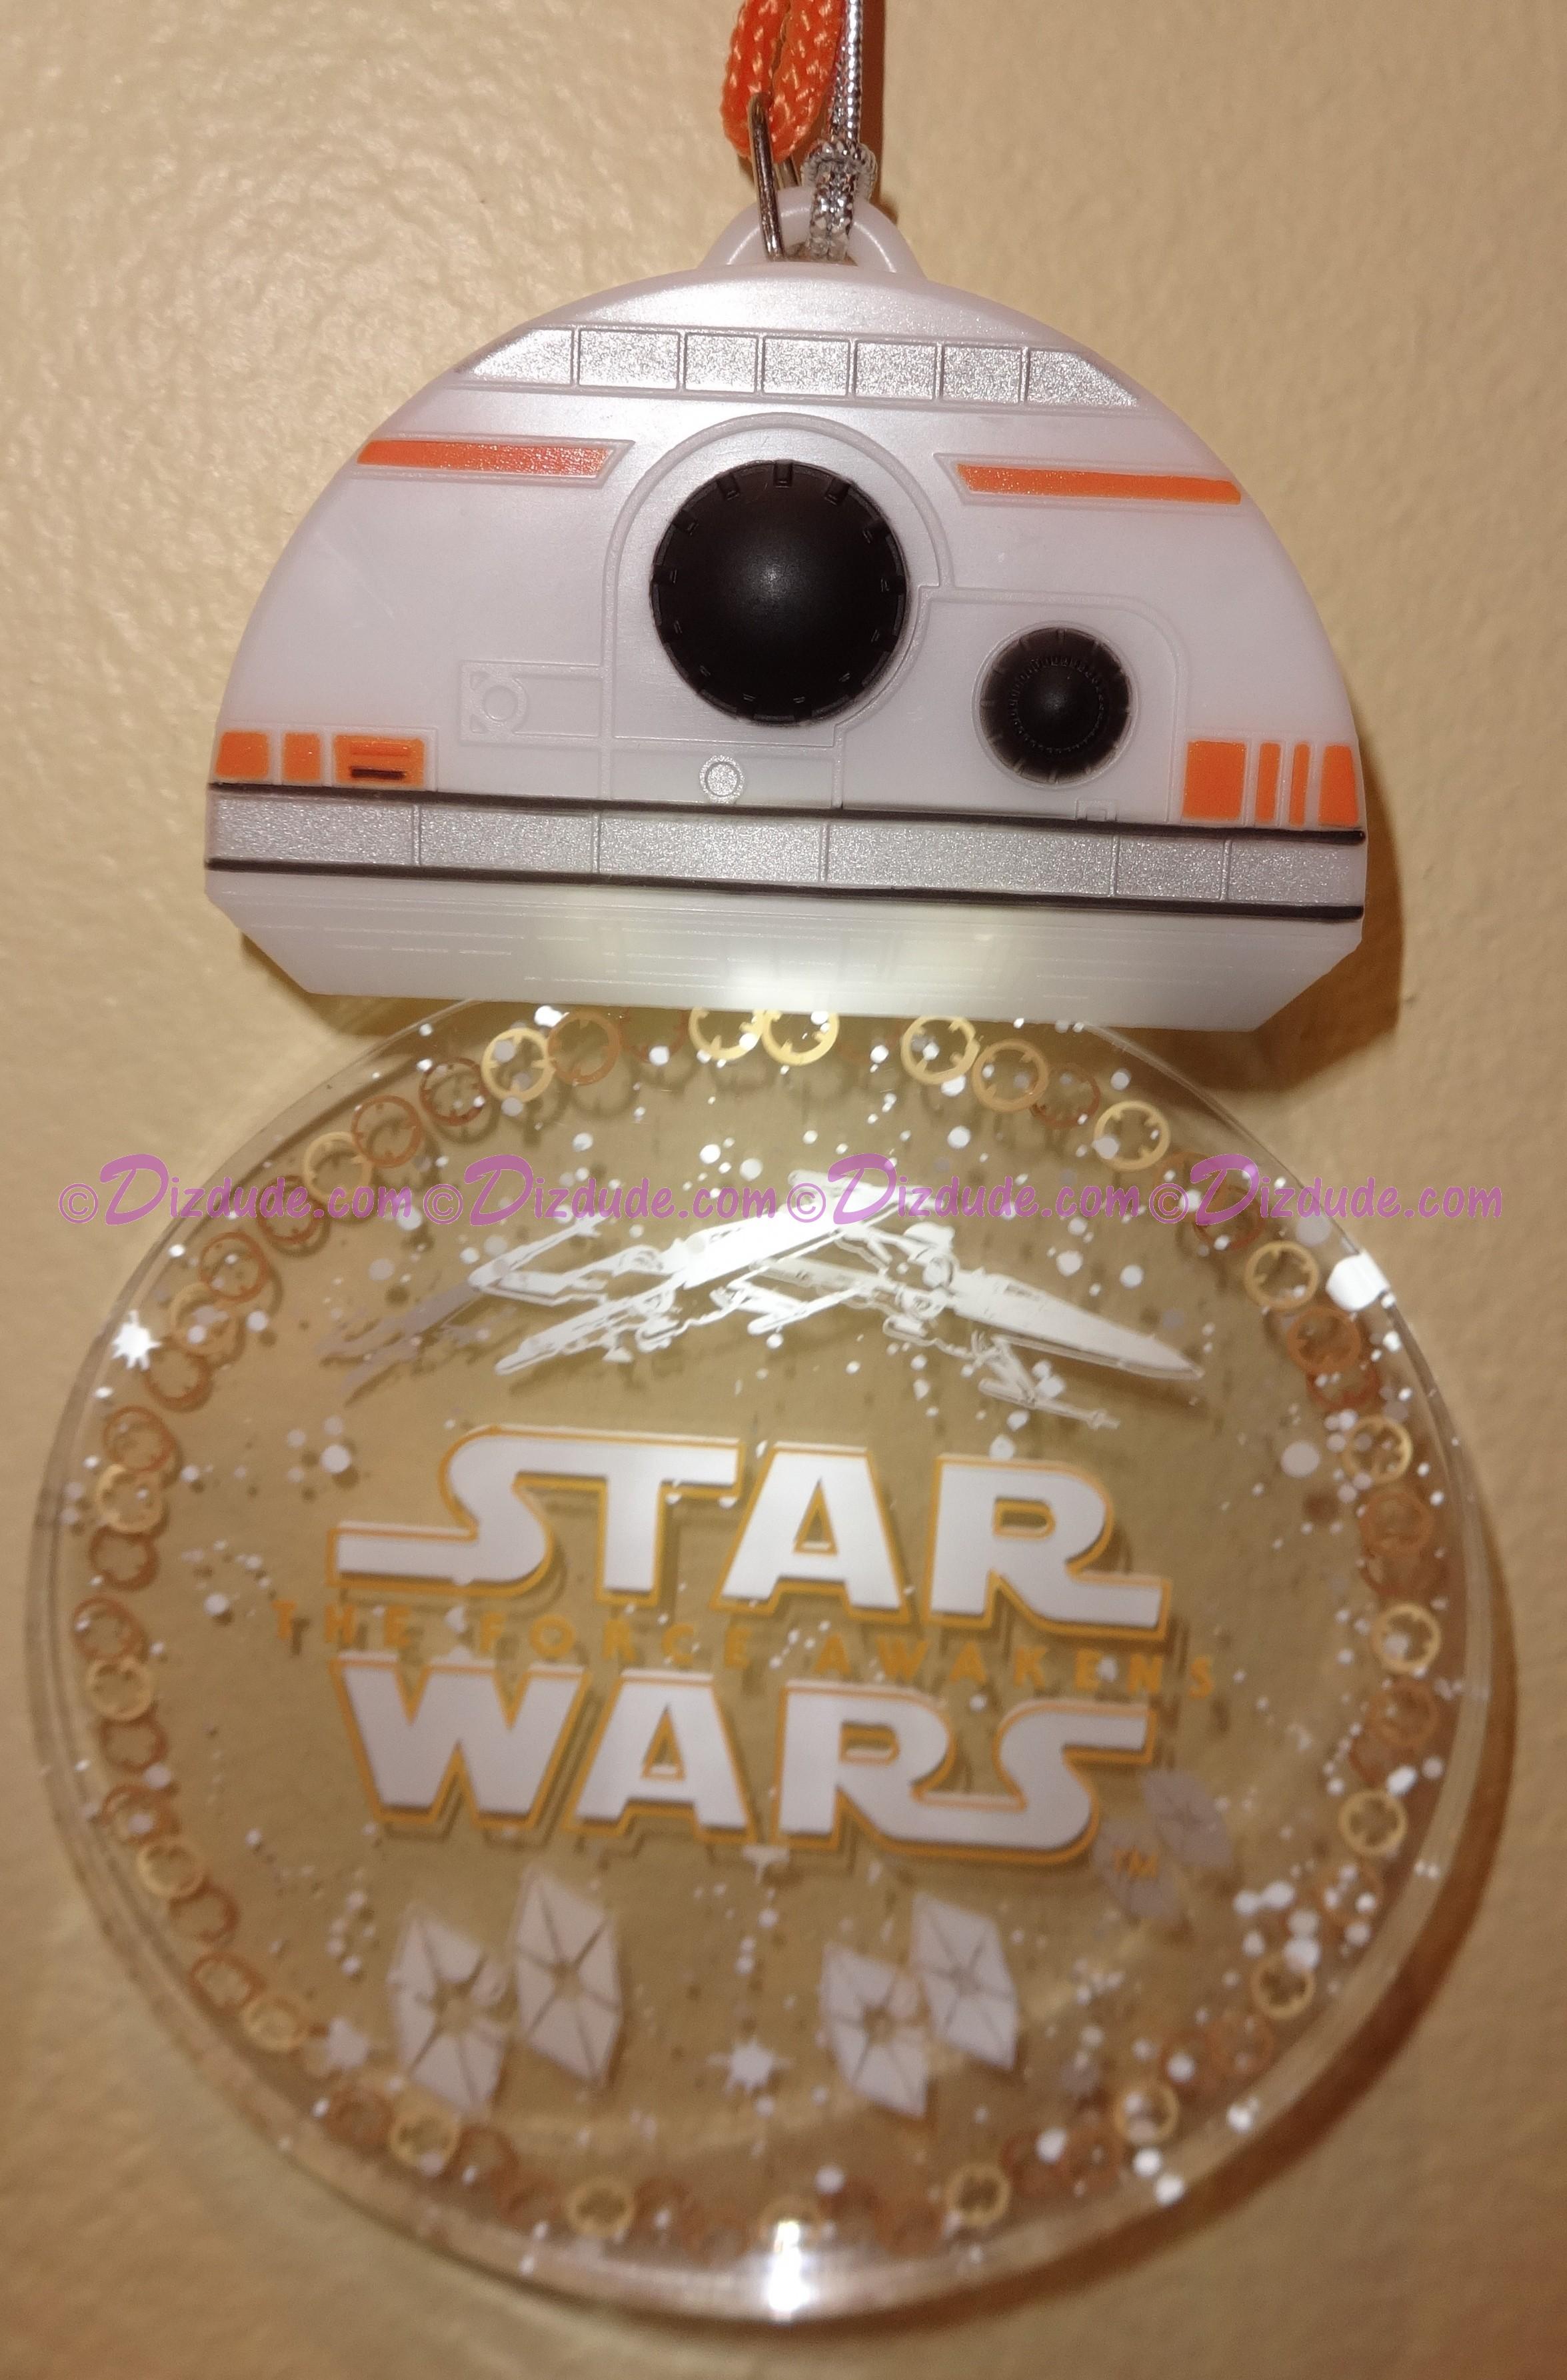 Disney Star Wars: The Force Awakens BB-8 Glow Lanyard or Christmas Ornament © Dizdude.com